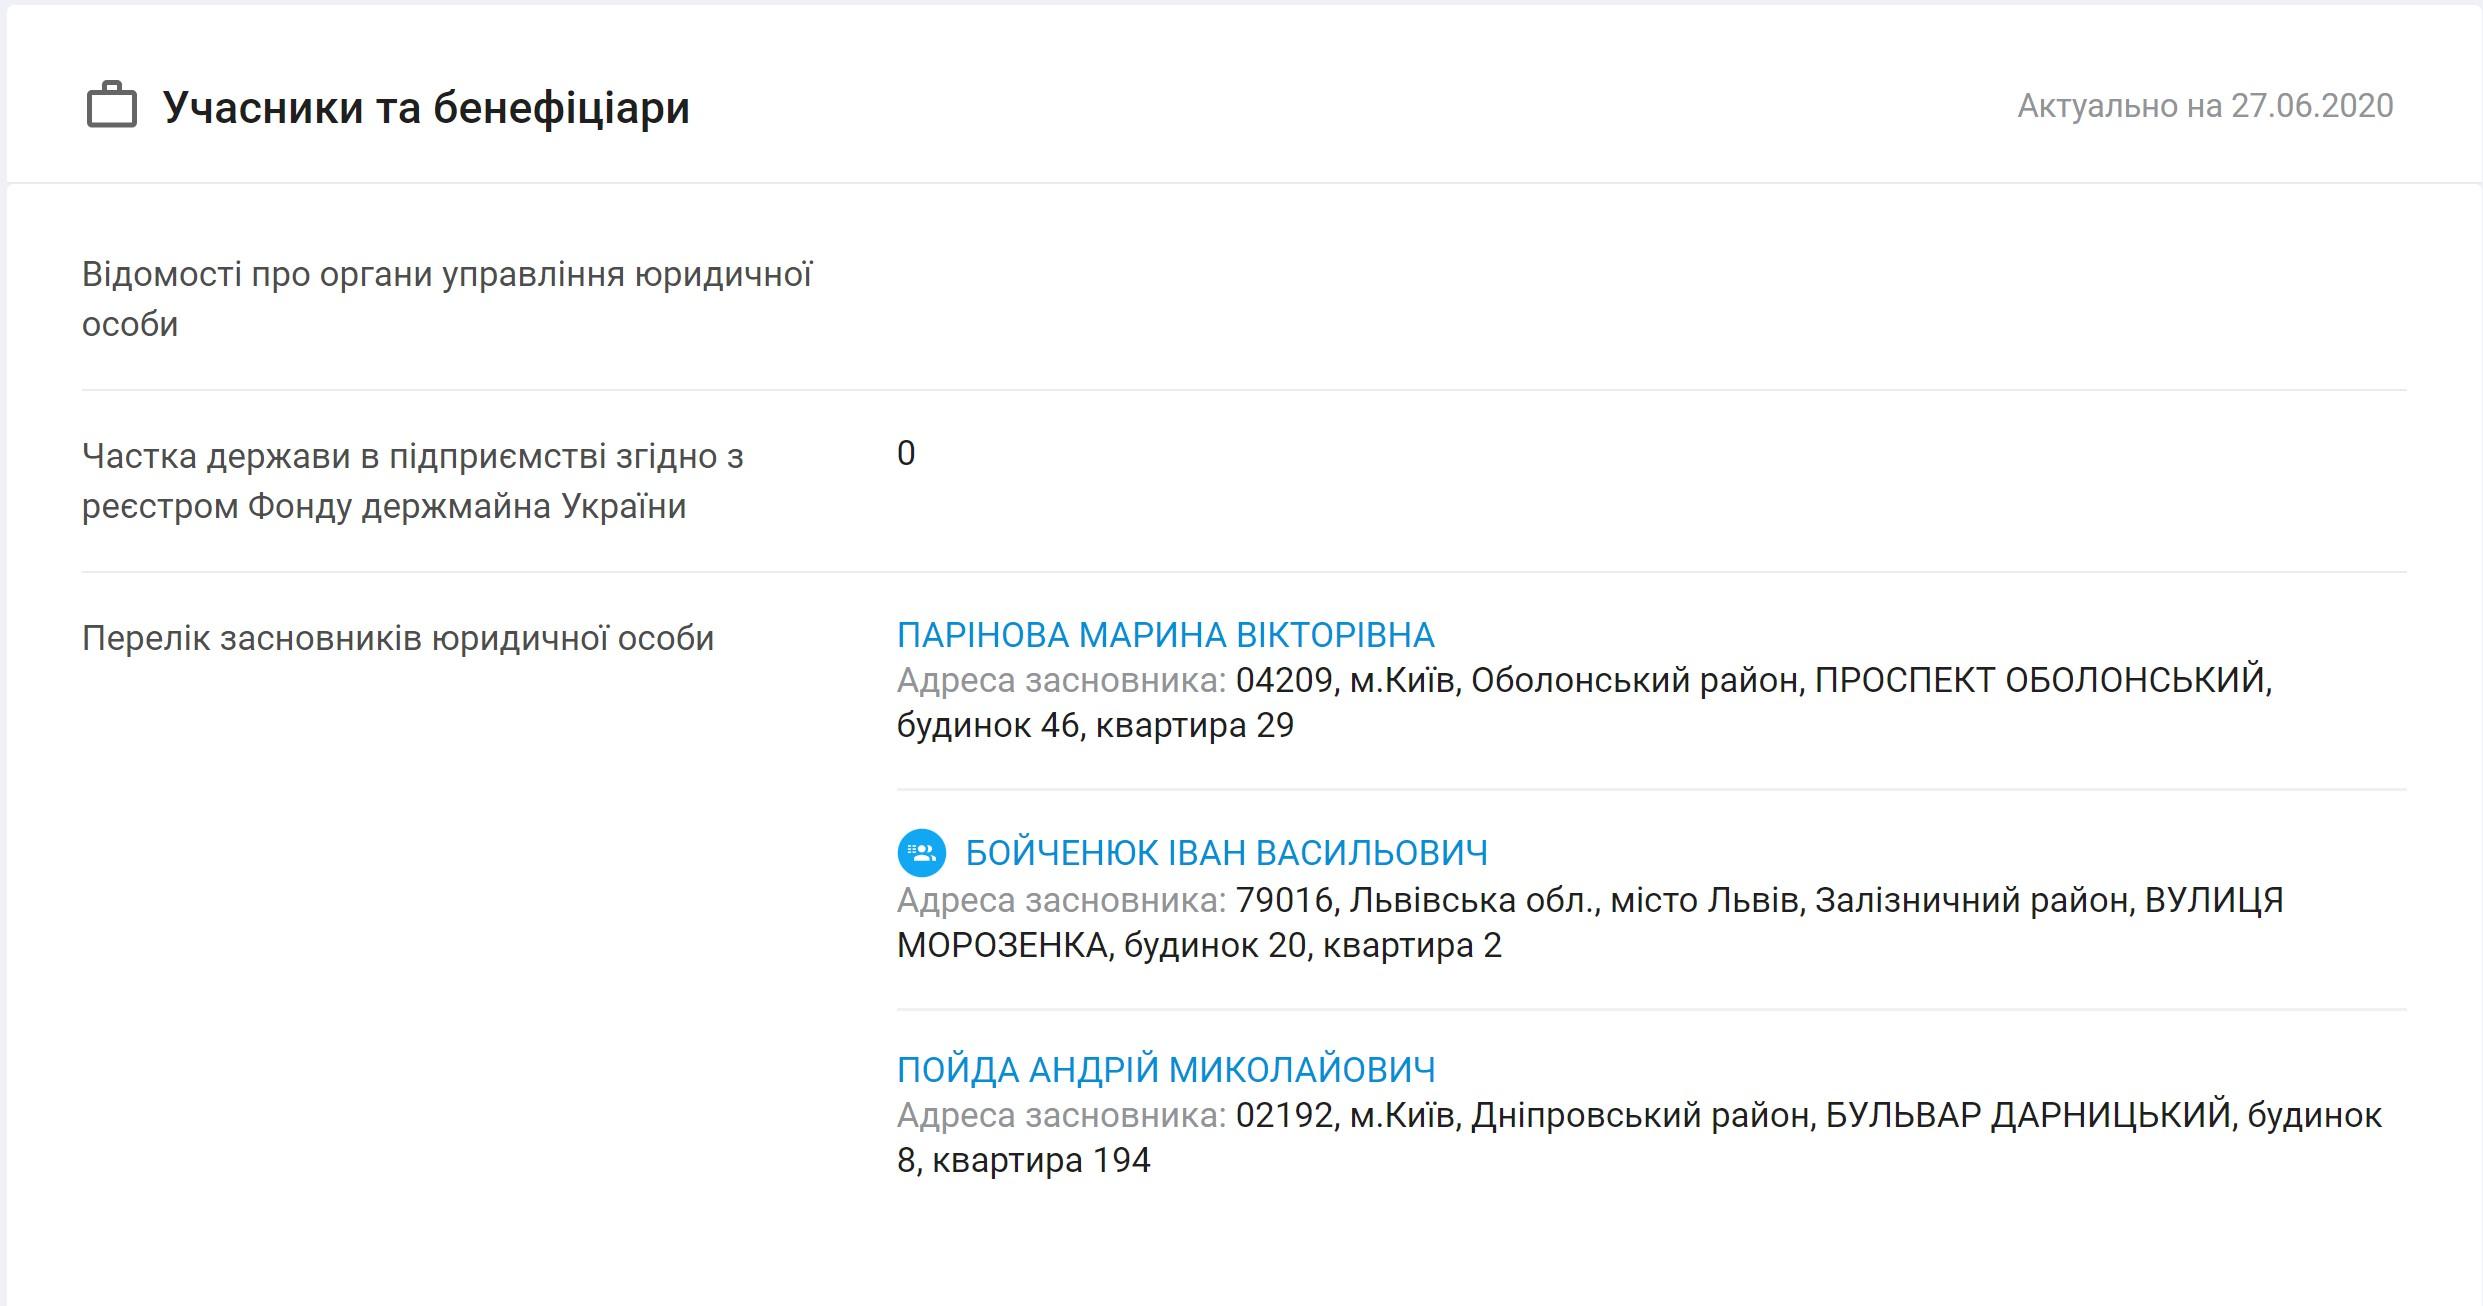 https://myrotvorets.news/wp-content/uploads/2020/06/Парінова-5.jpg